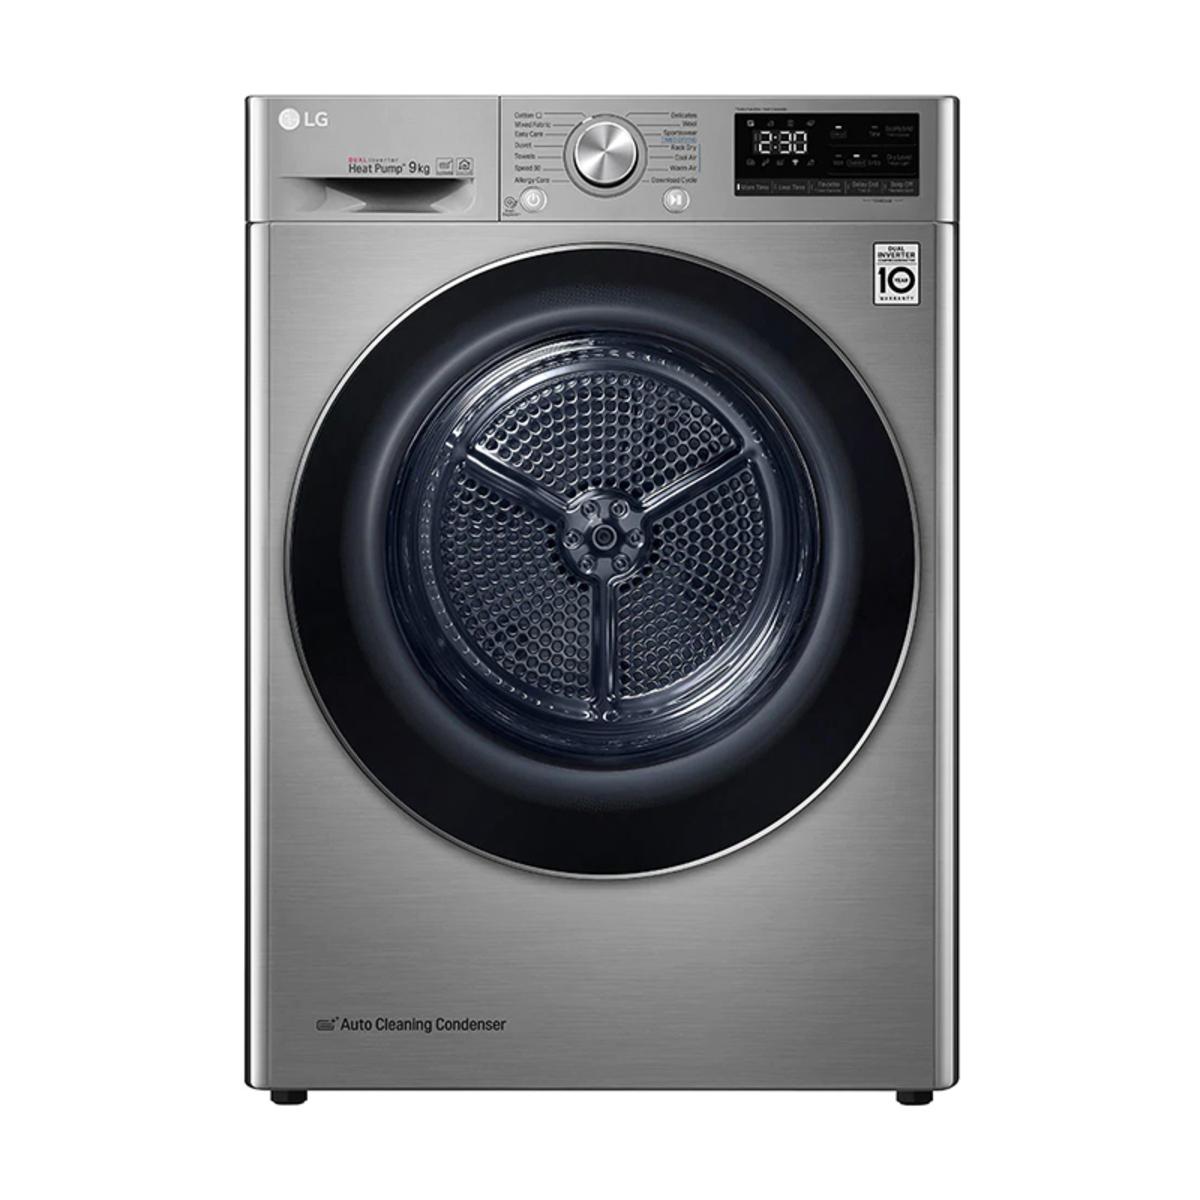 LG FDV909W A+++ Eco Hybrid 9Kg Heat Pump Tumble Dryer